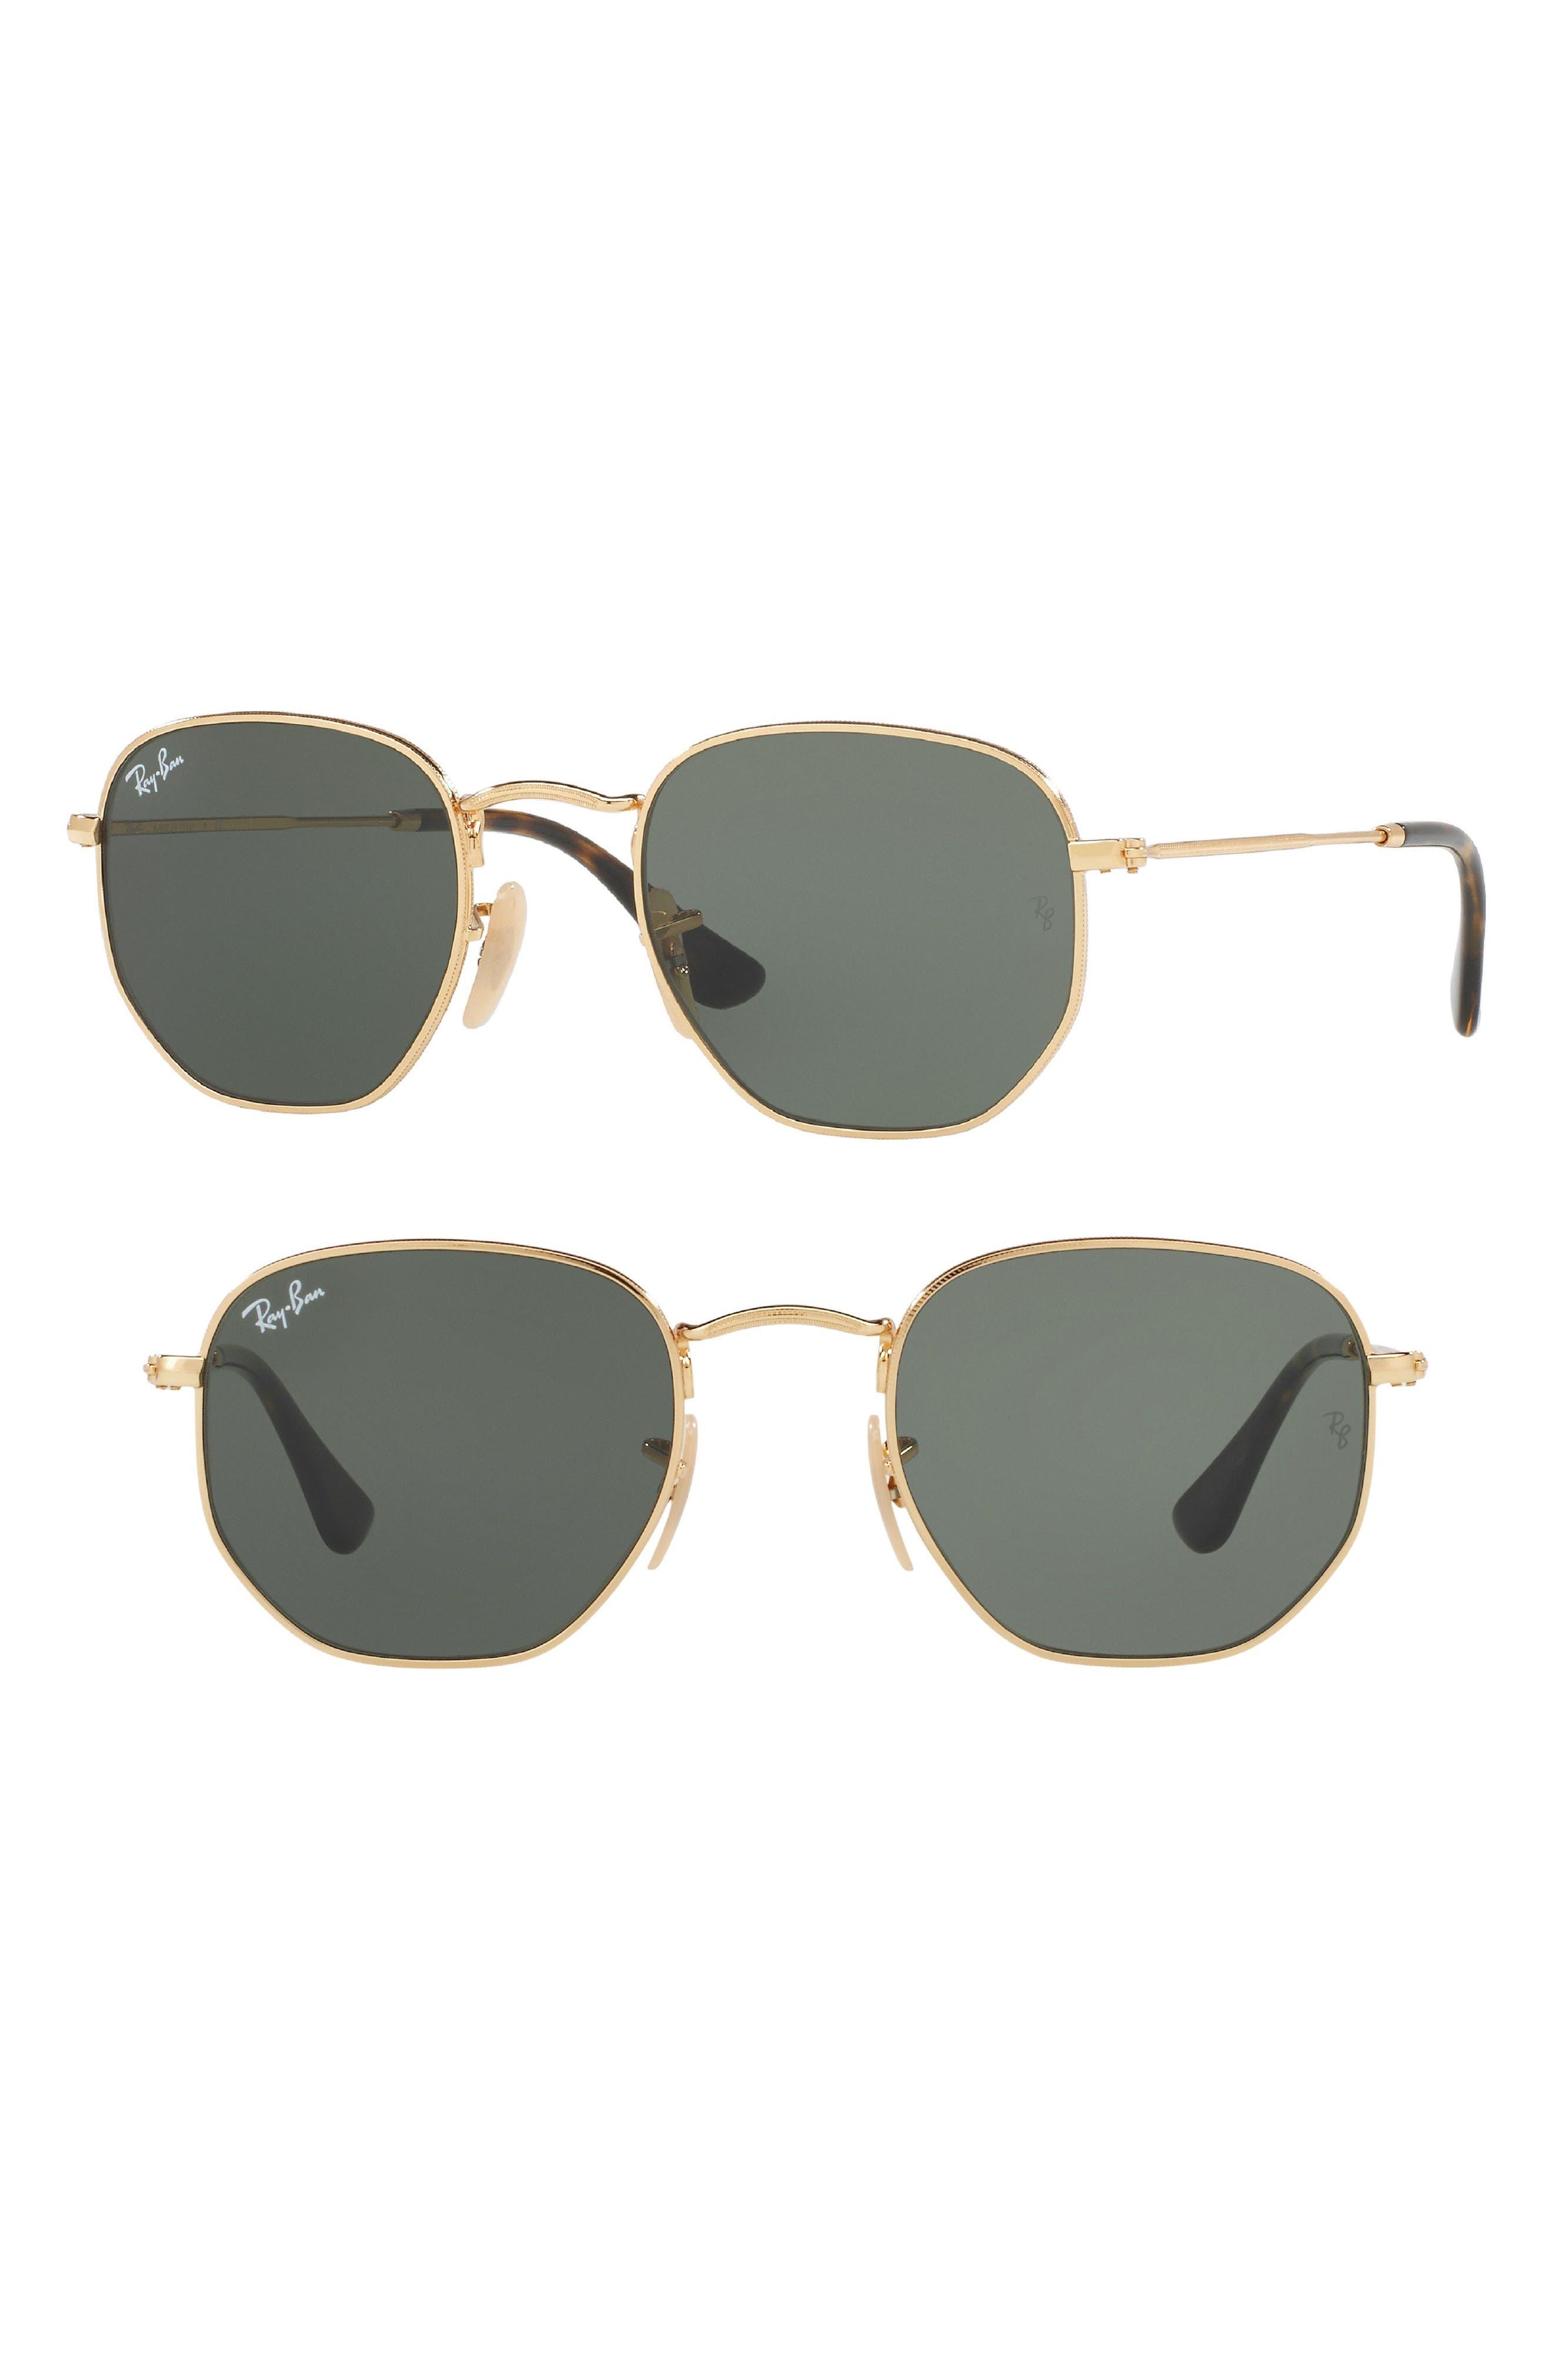 48mm Hexagonal Flat Lens Sunglasses,                         Main,                         color, Gold/ Green